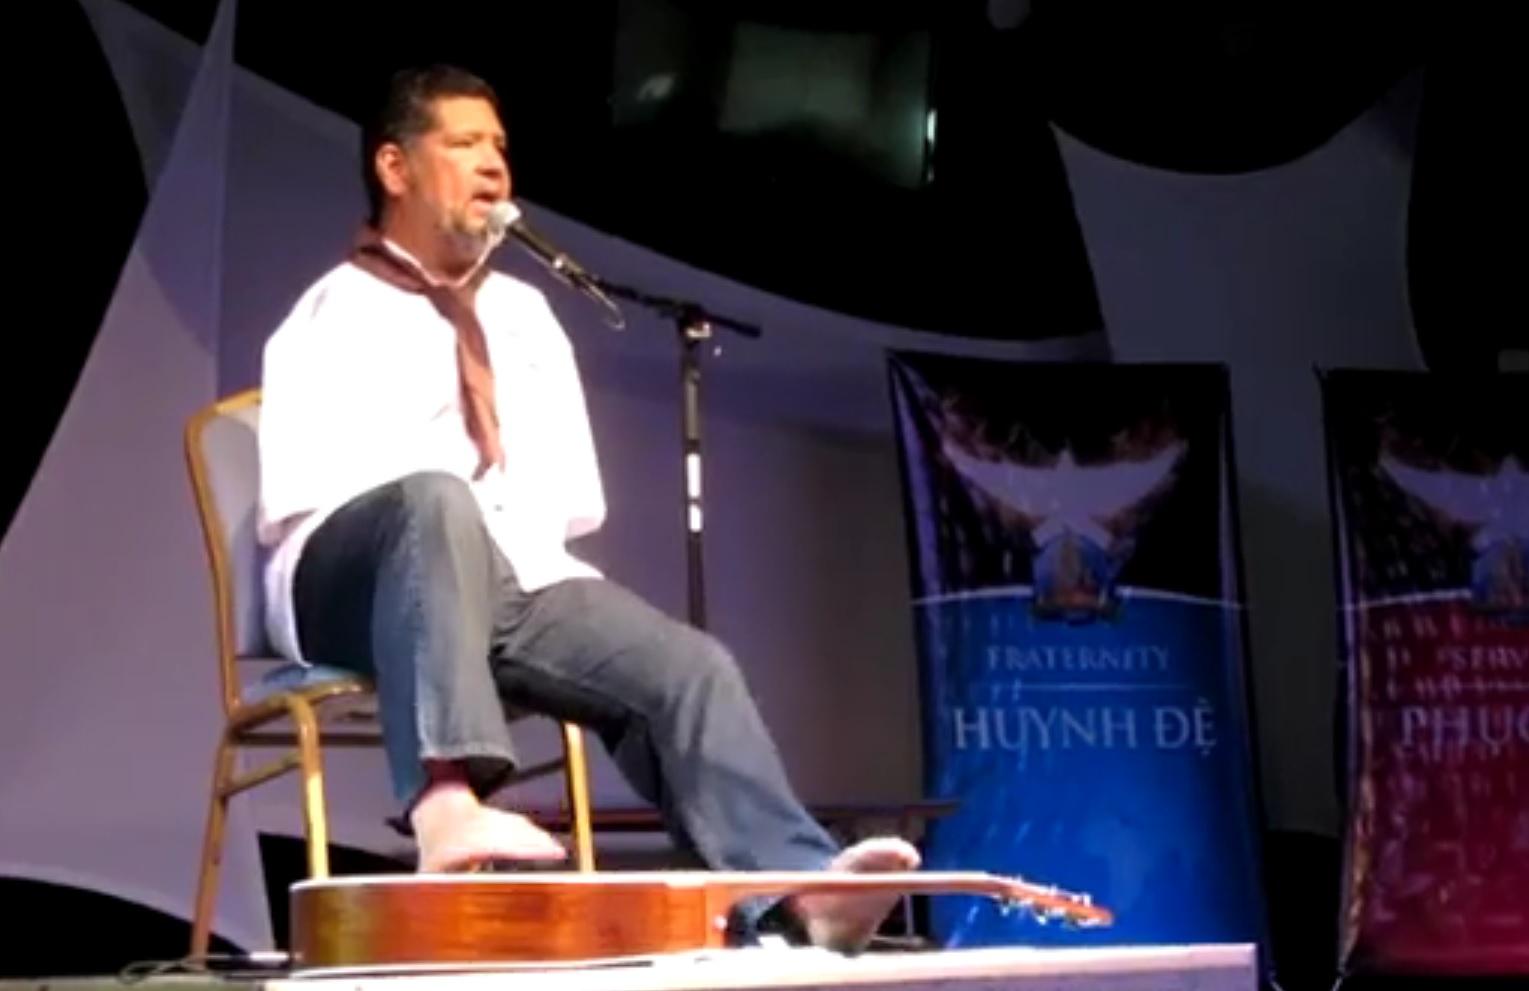 VIDEO: PRAVI ČAROBNJAK - Nema ruke, ali je majstor na gitari - pogledajte